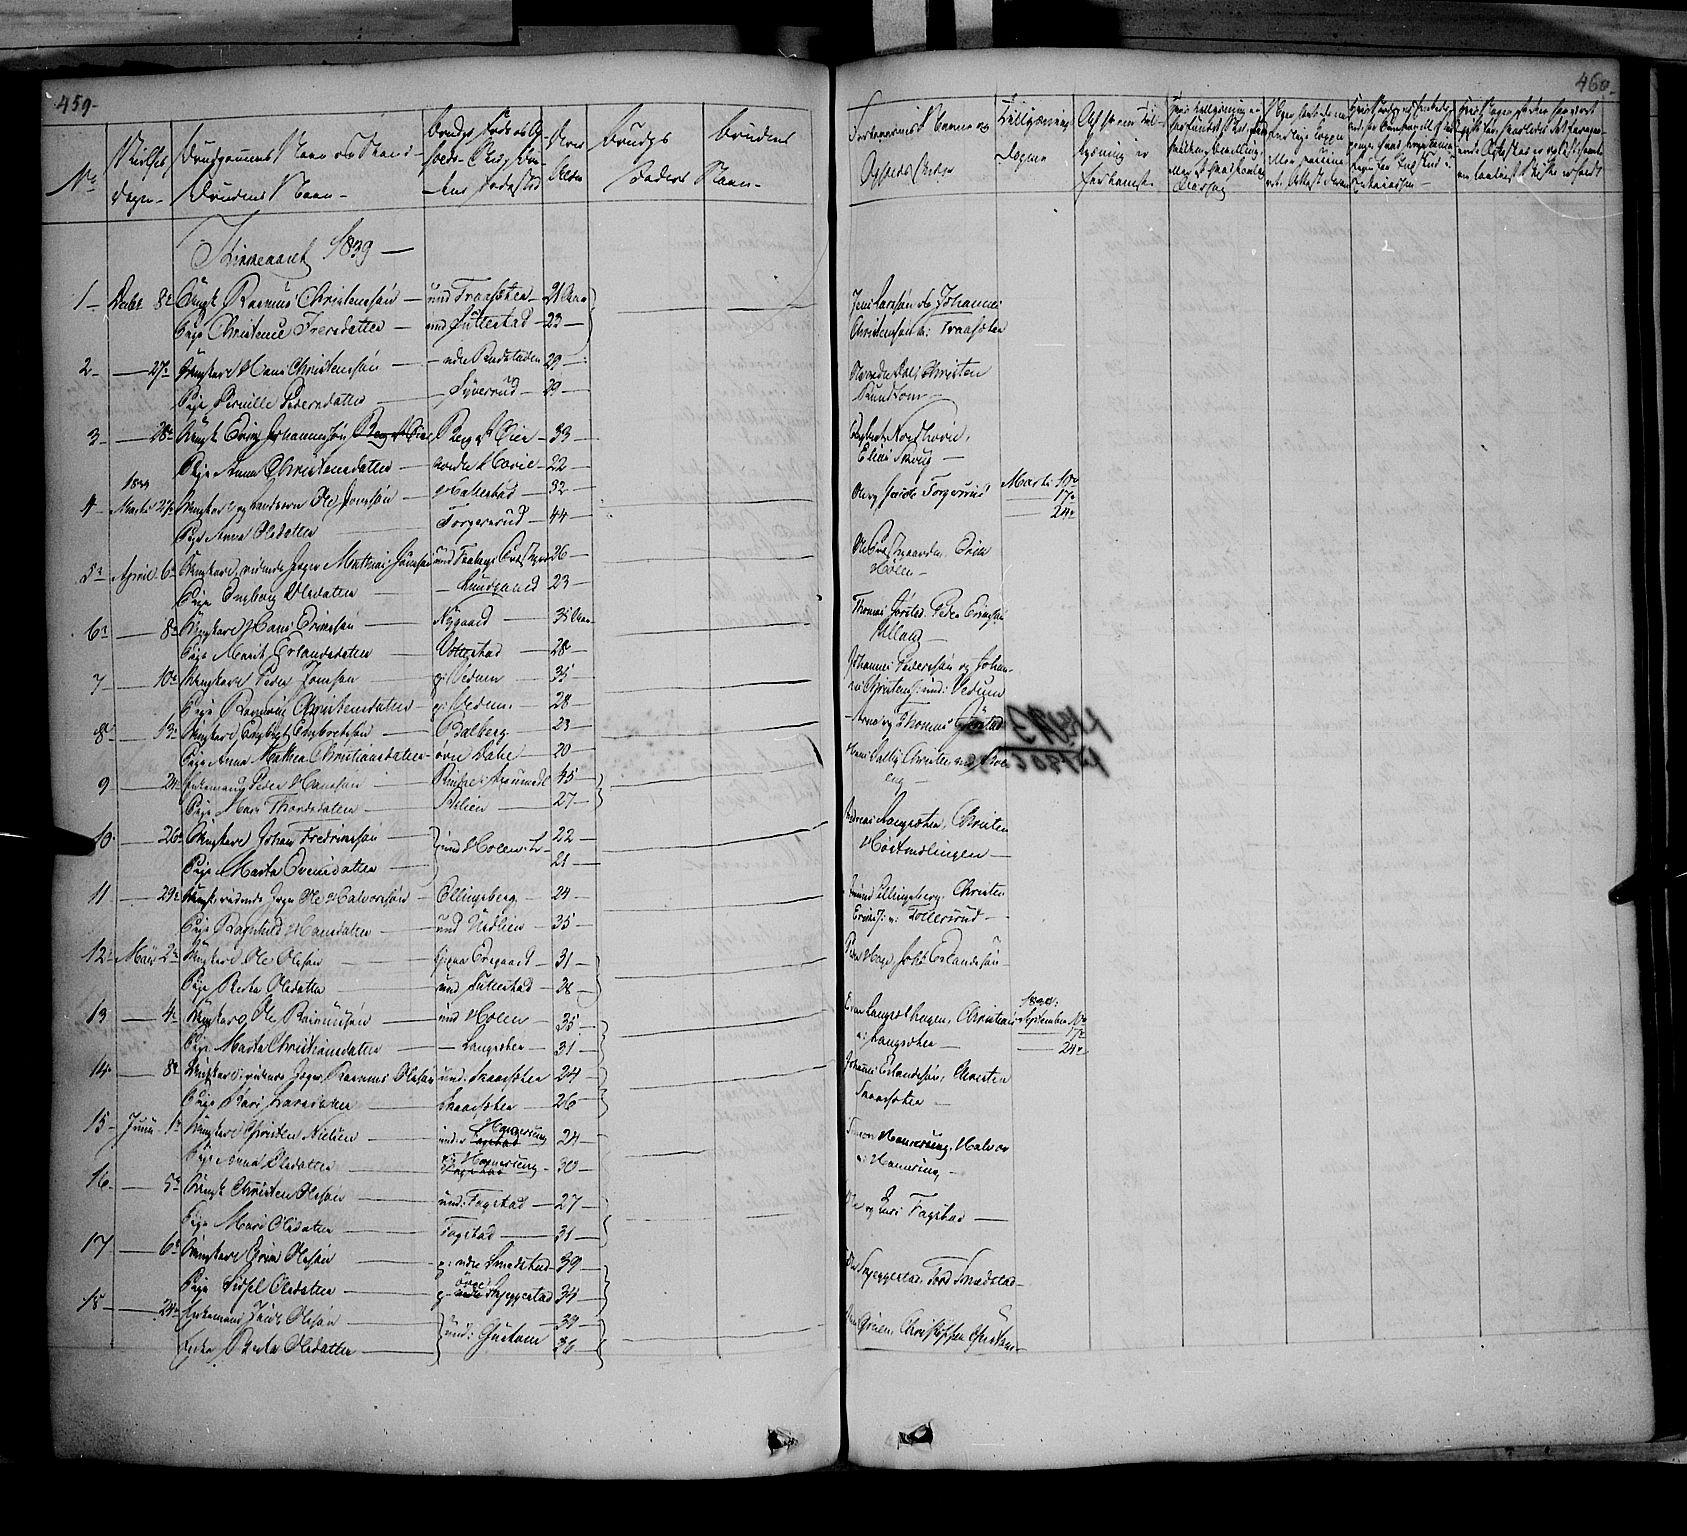 SAH, Fåberg prestekontor, Ministerialbok nr. 5, 1836-1854, s. 459-460